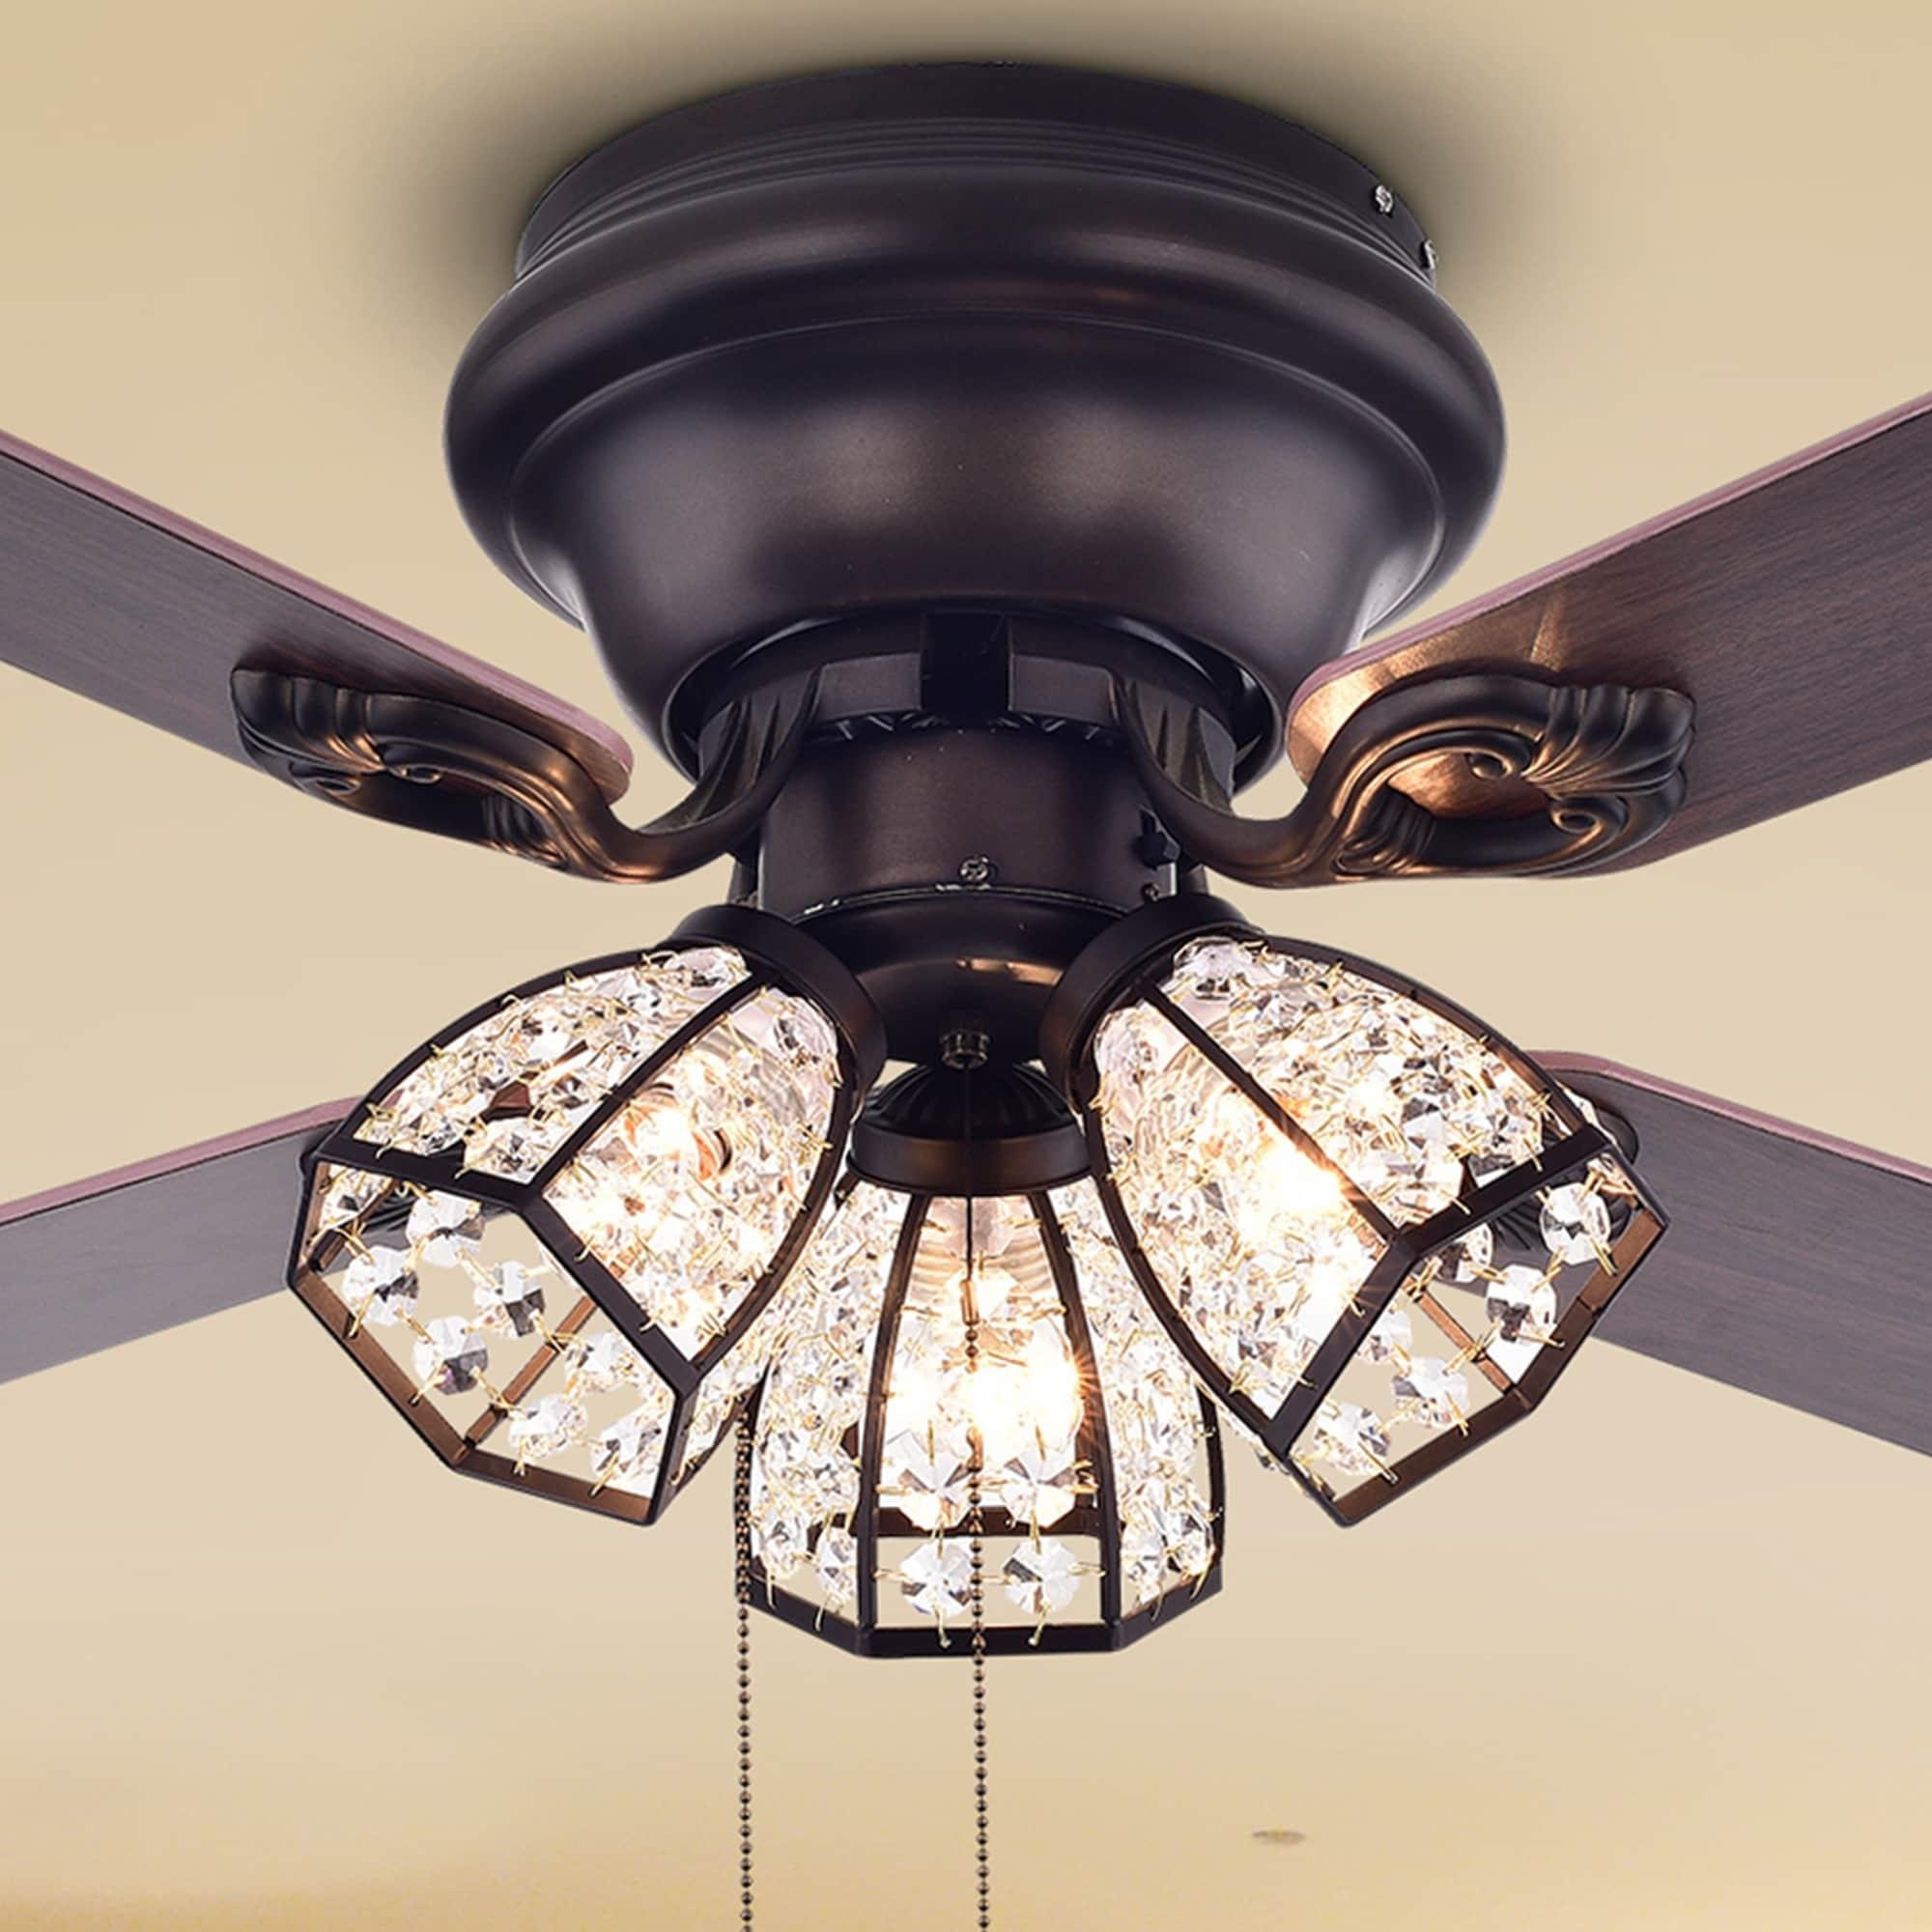 42 Inch 3 Light Lighted Ceiling Fan